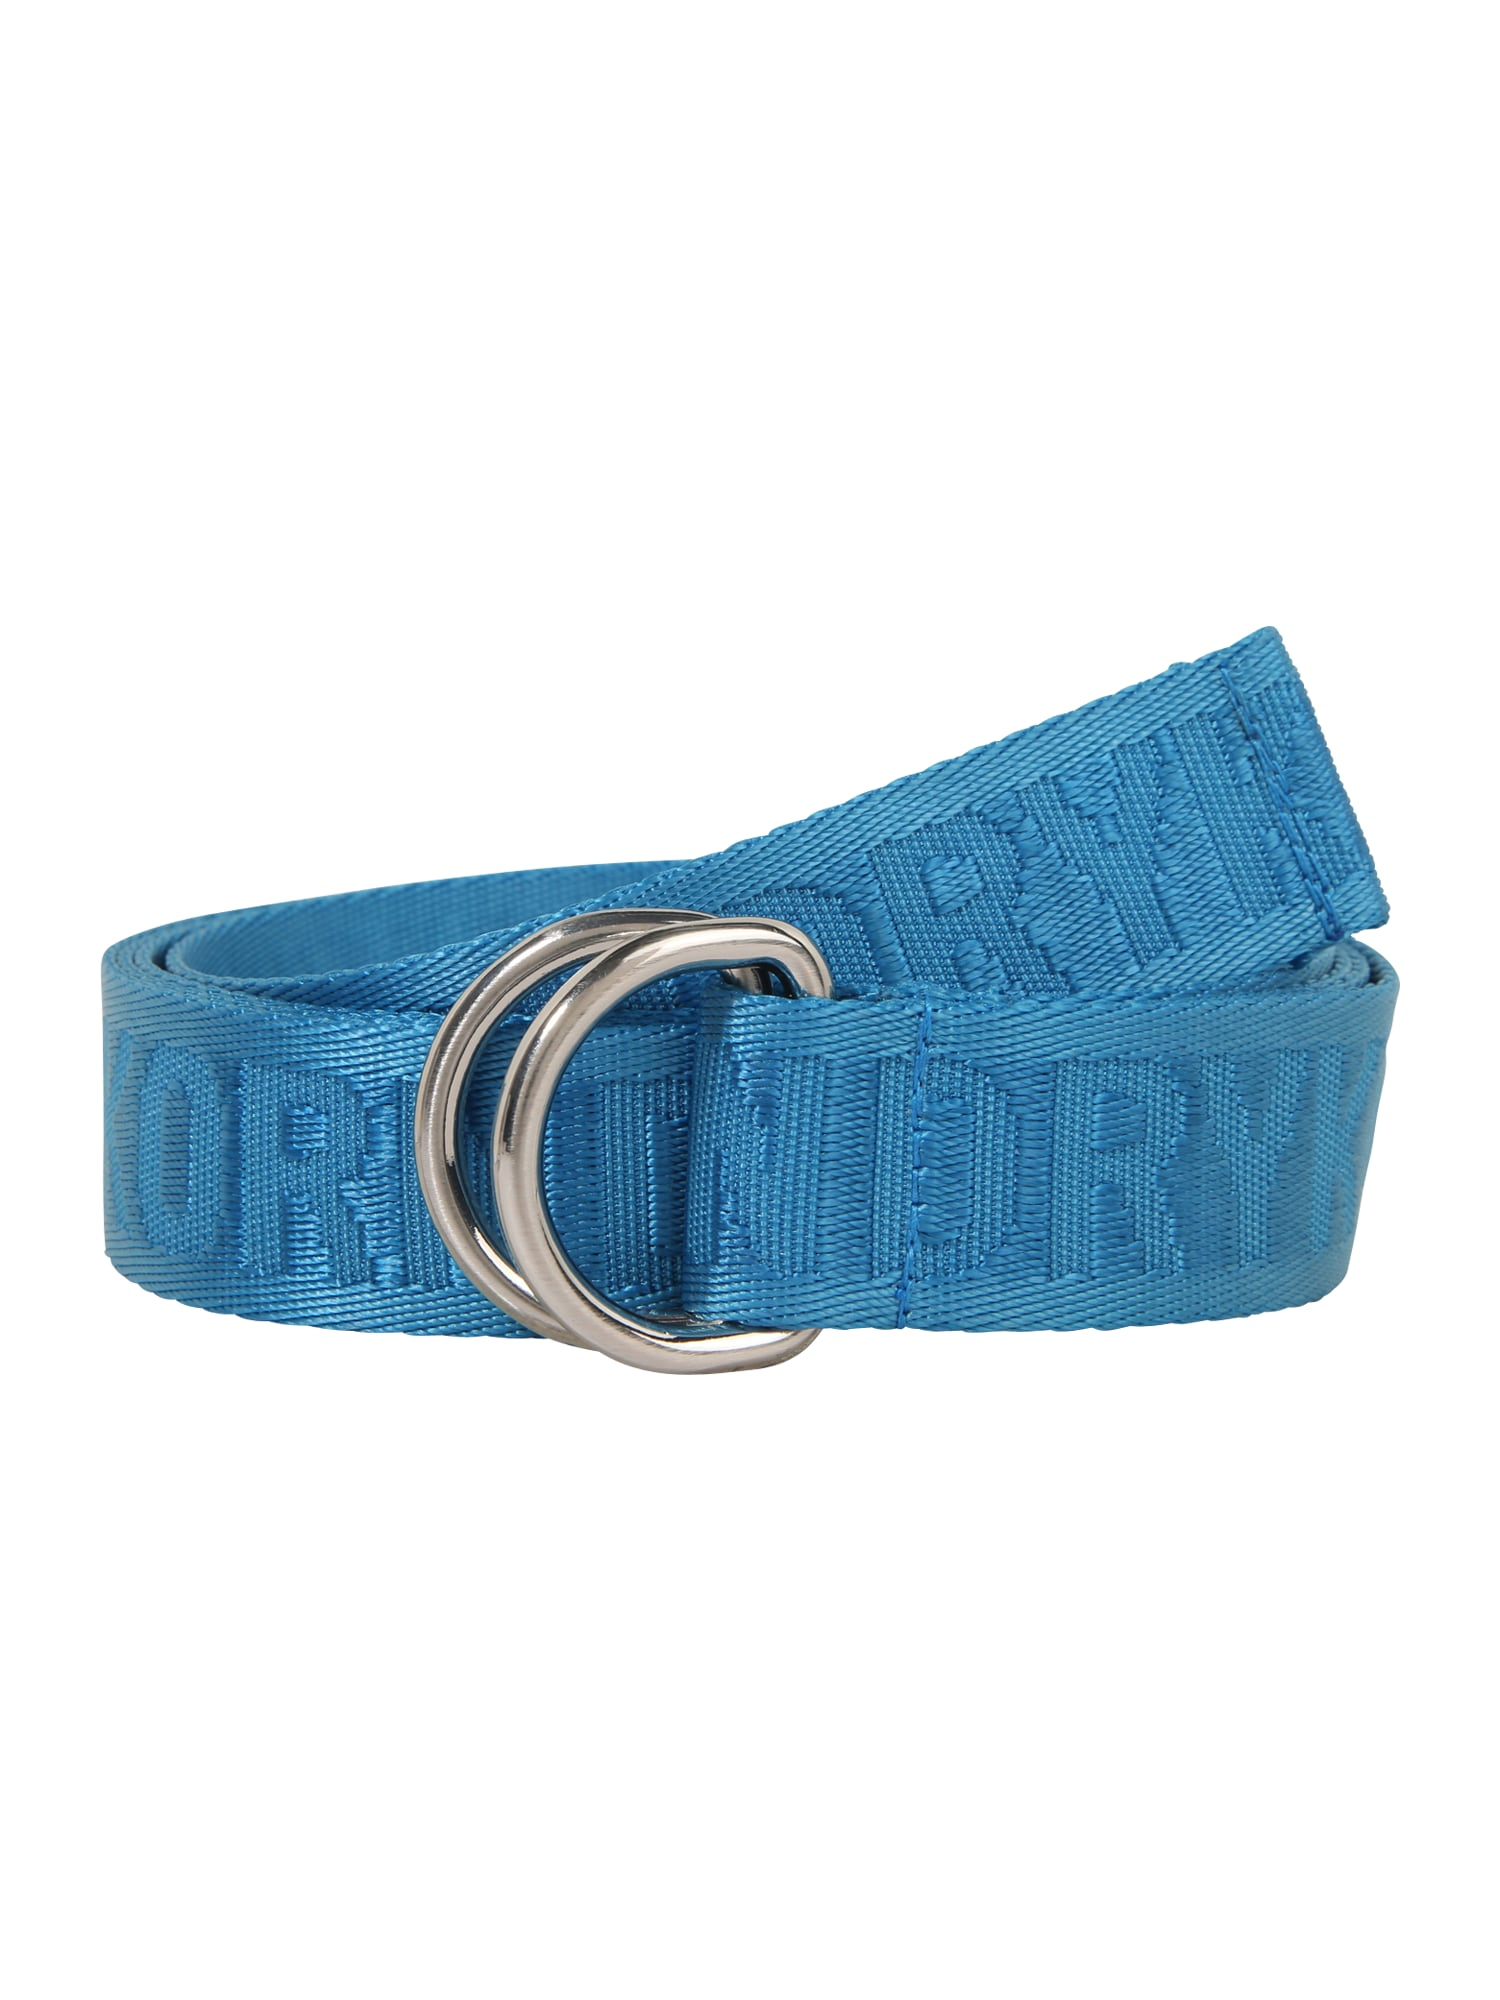 DRYKORN Diržas 'HARNESS' mėlyna